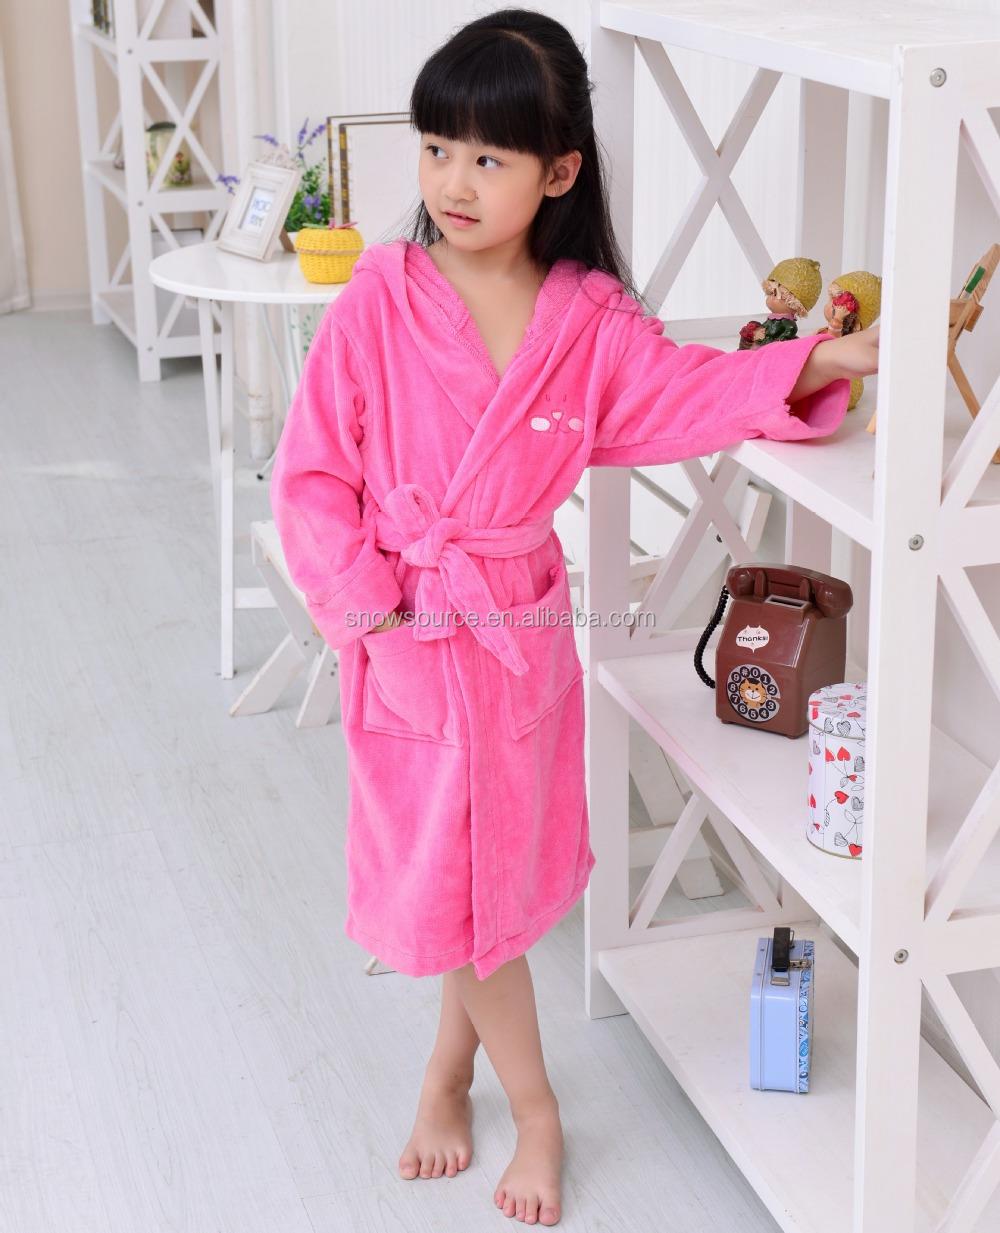 Babydool Printing Baju Tidur Santai Impor 0046 Lihat Daftar Harga Lingerie Babydoll Teddy Sexy 087 Source Dsc 9493